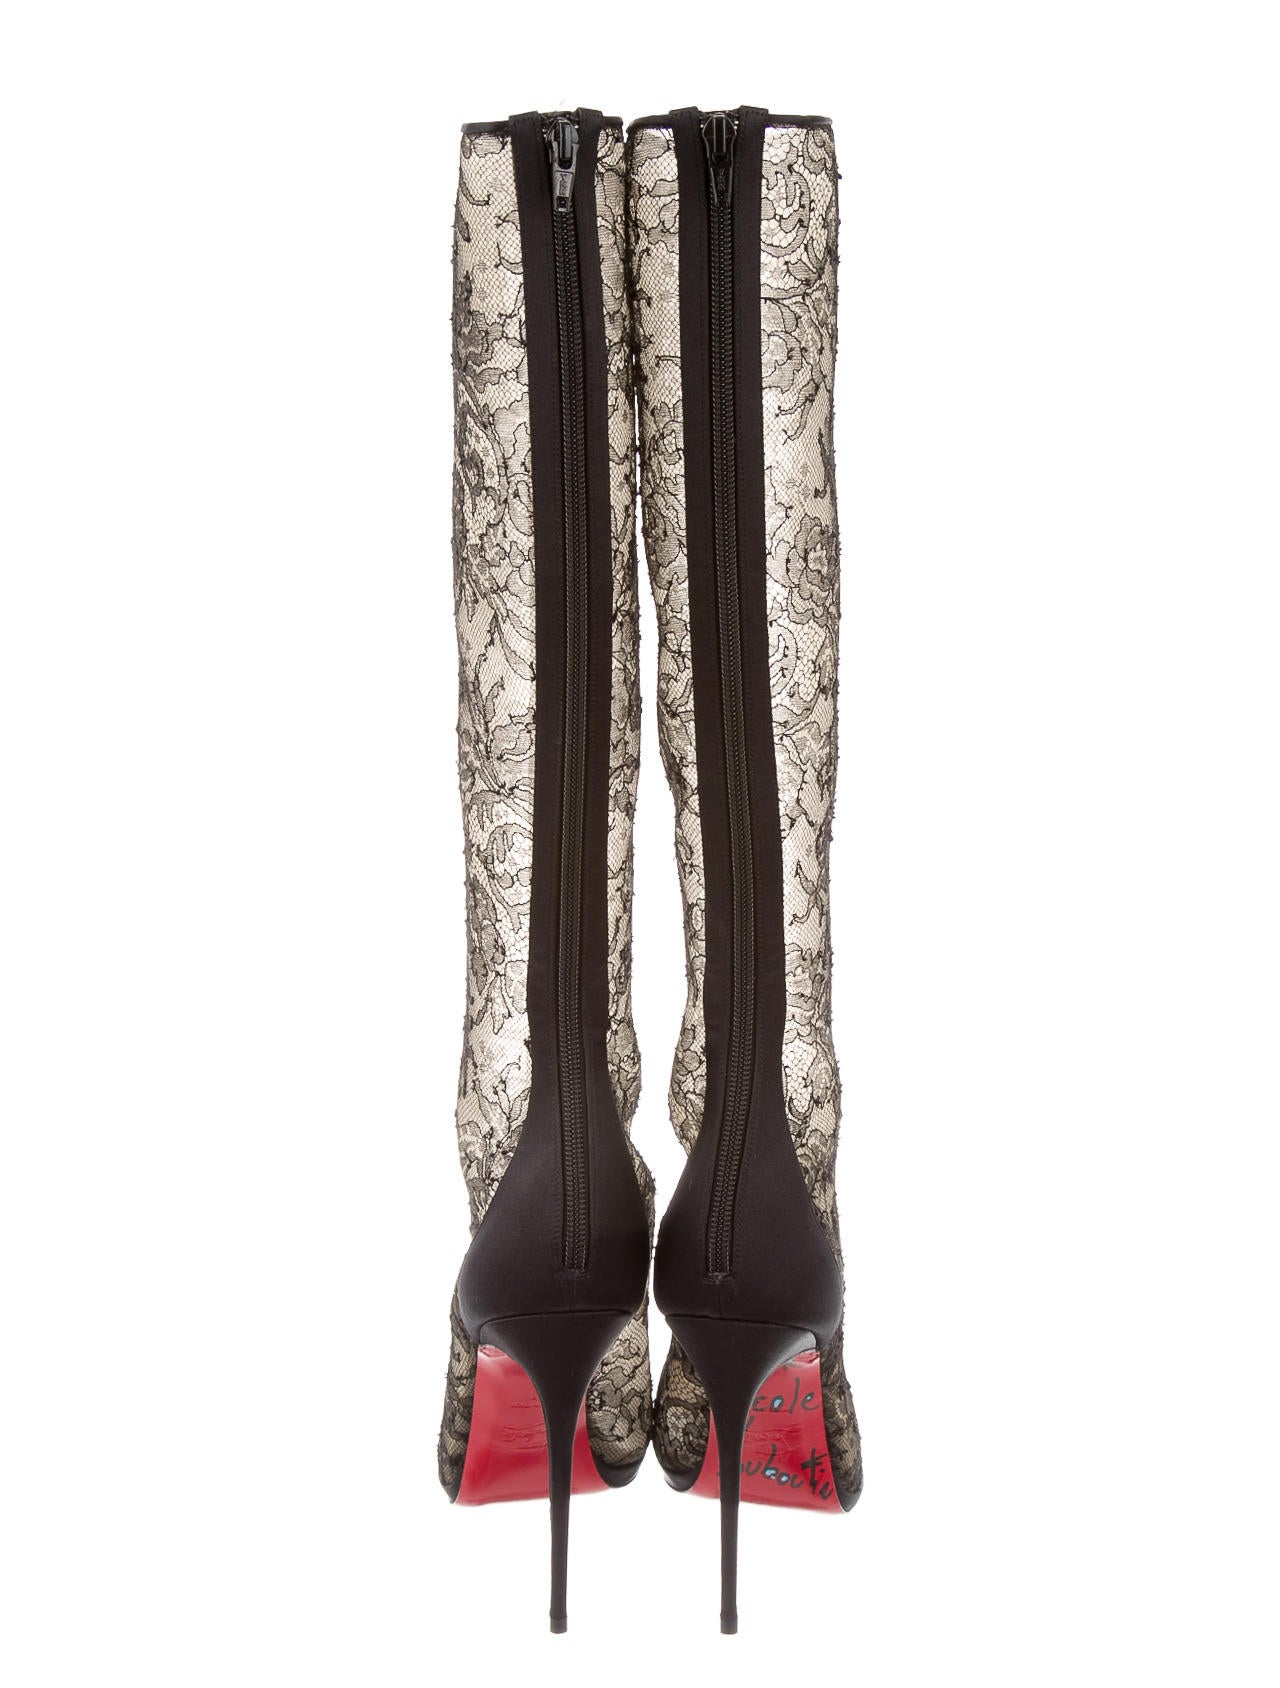 fake louis vuitton mens shoes - christian louboutin alta dentelle 120 boots, replica louboutins